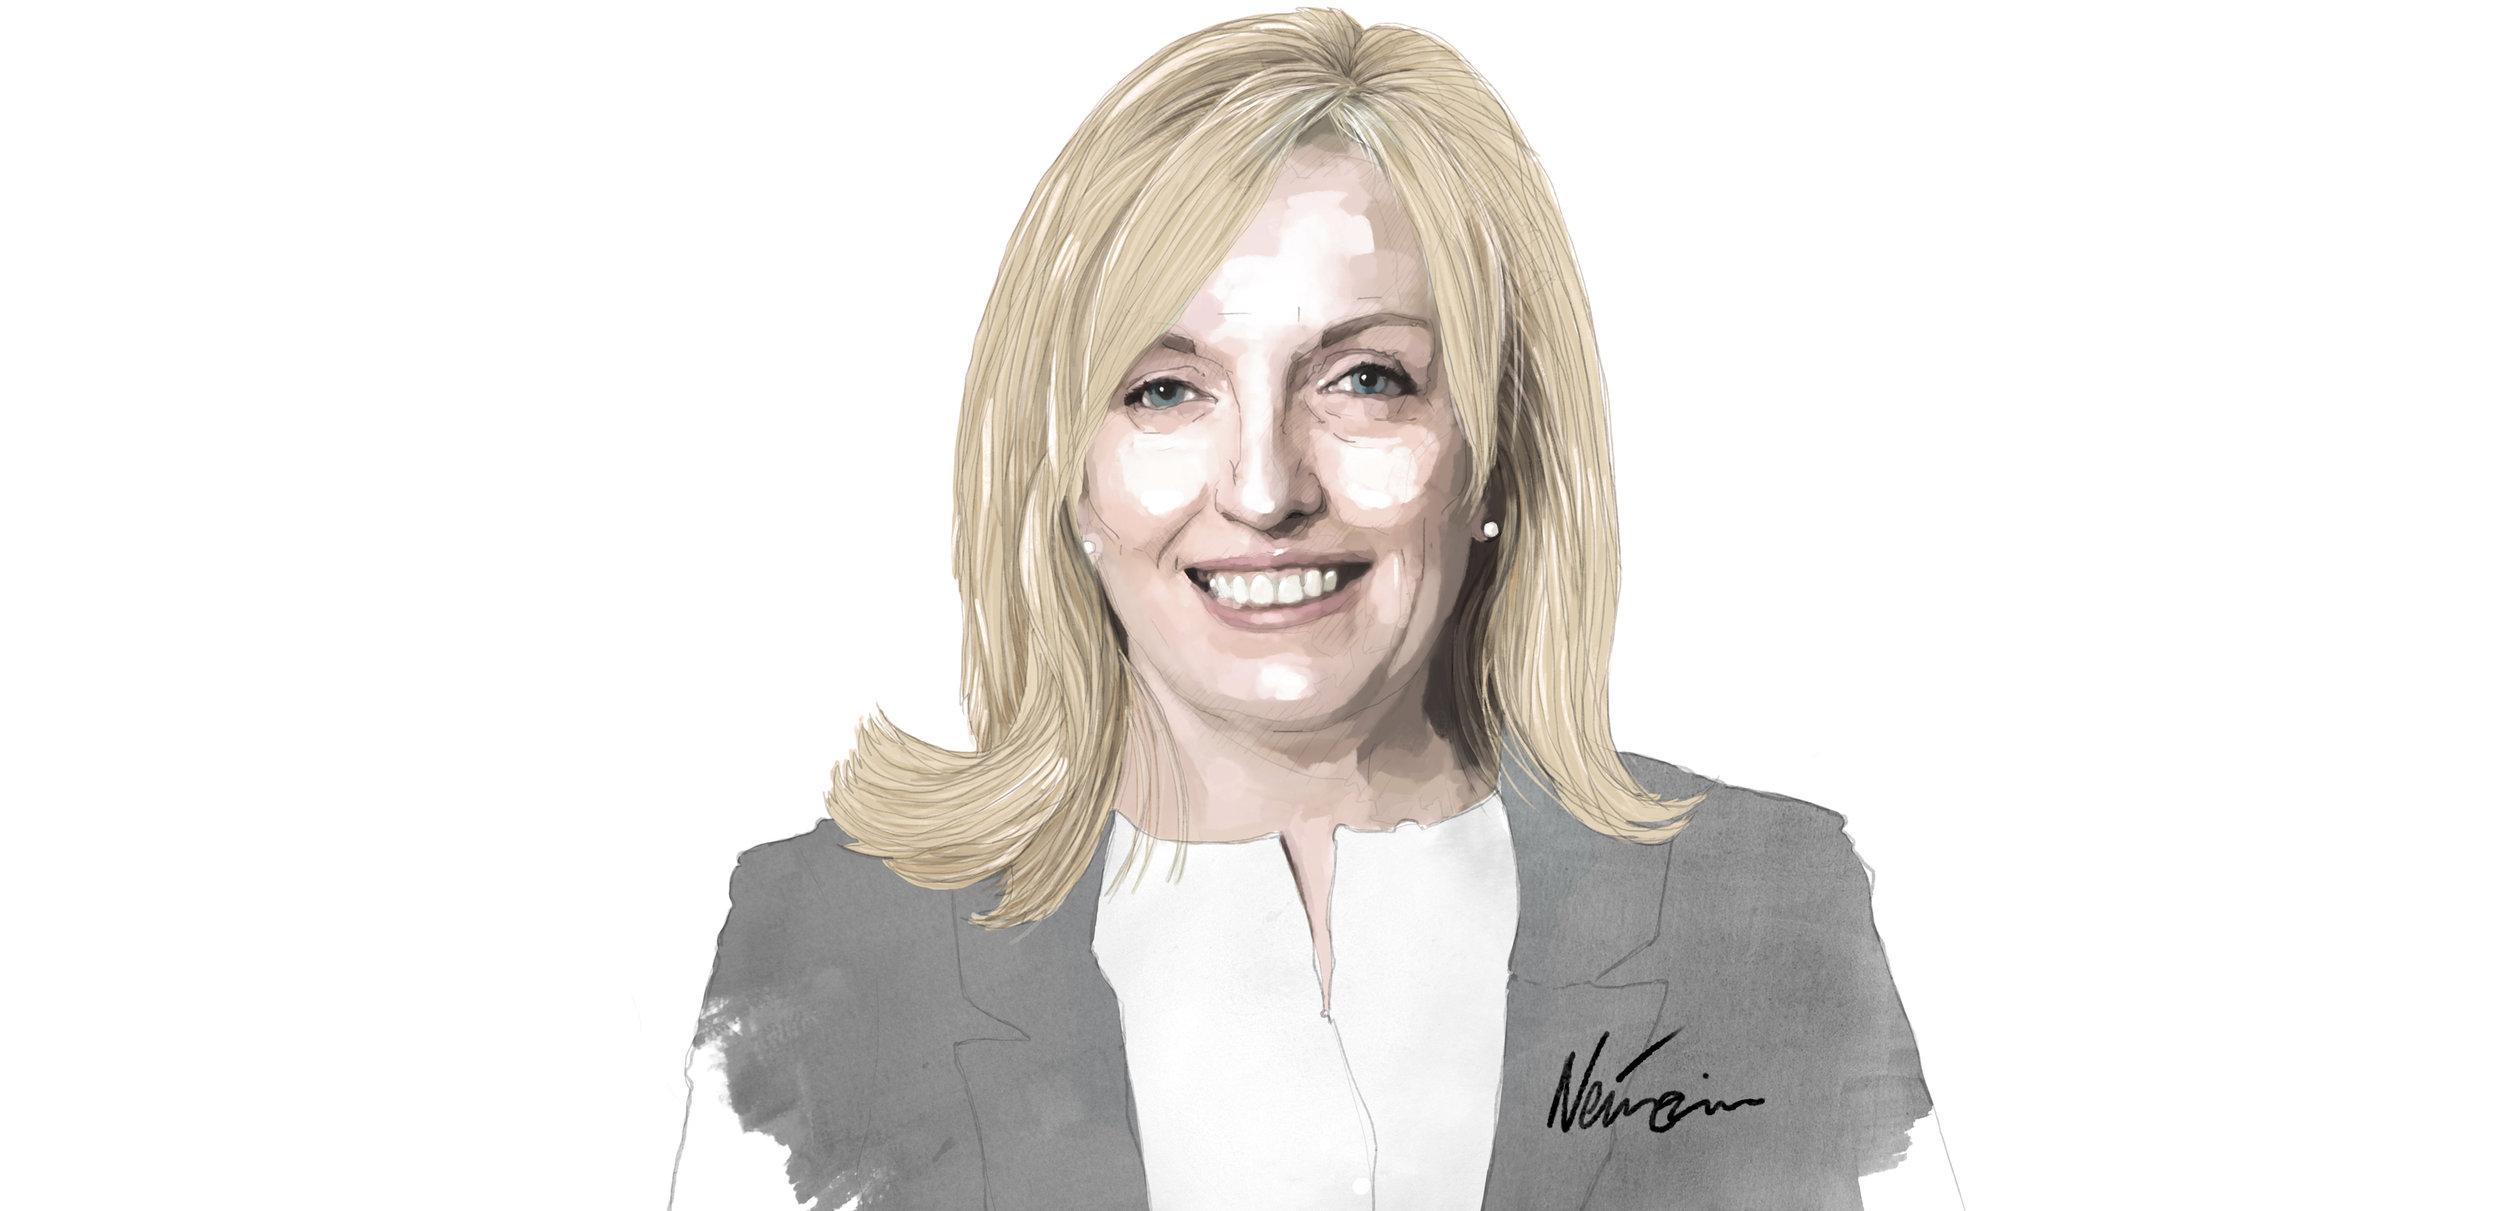 Christine Holgate for Qantas Inflight Magazine